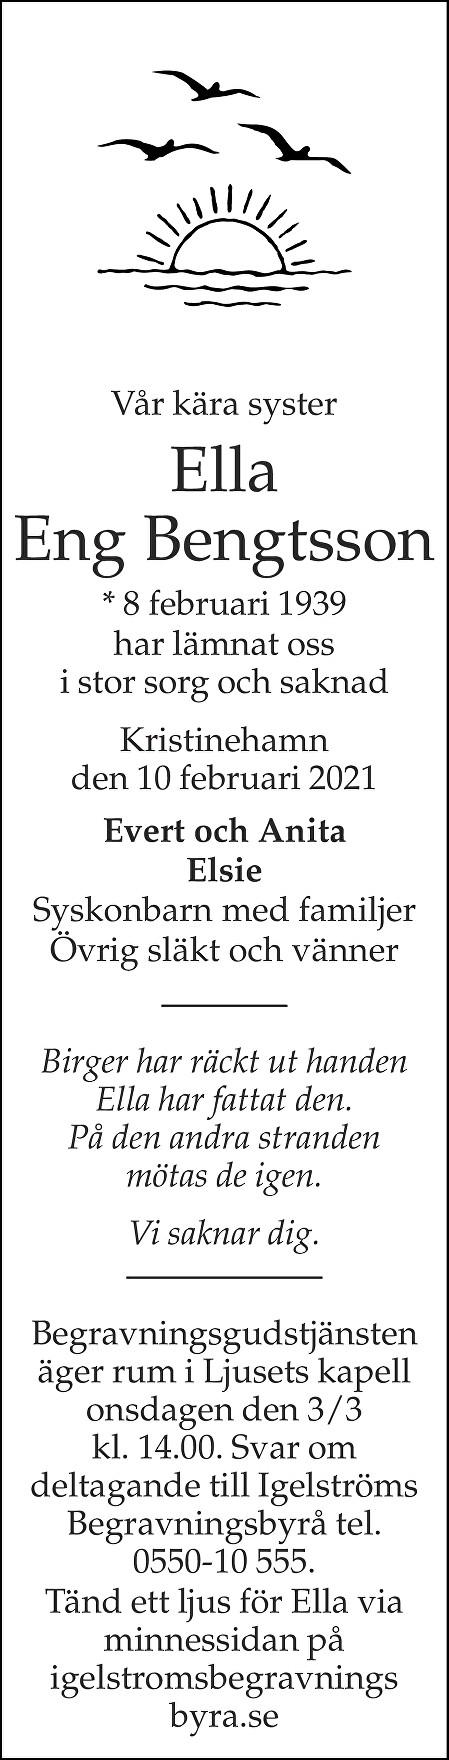 Ella Eng Bengtsson Death notice